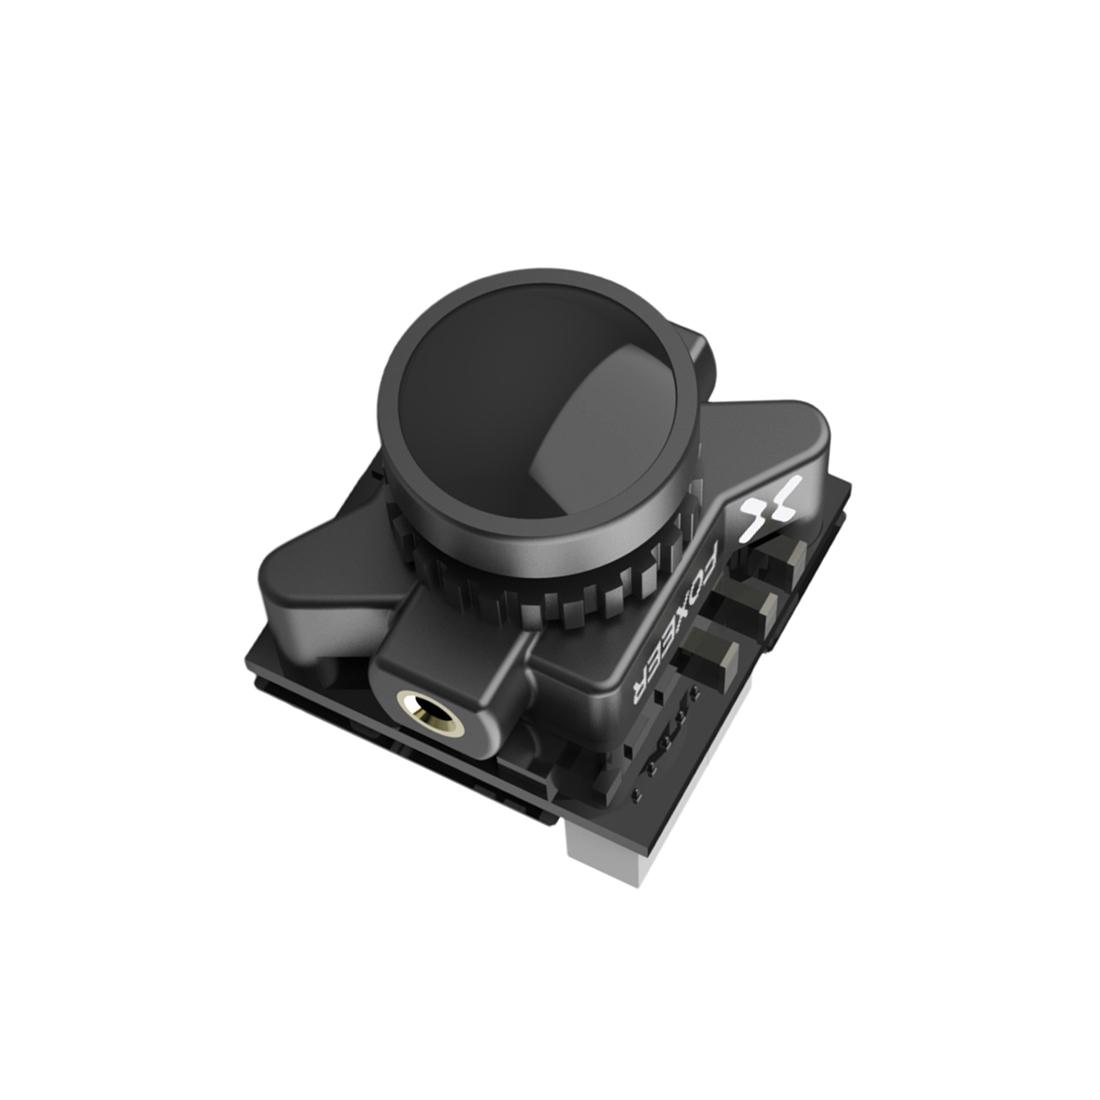 Foxeer SIF4 F4 Flytower Flugsteuerung mit Razer Micro 1200TVL FPV Kamera